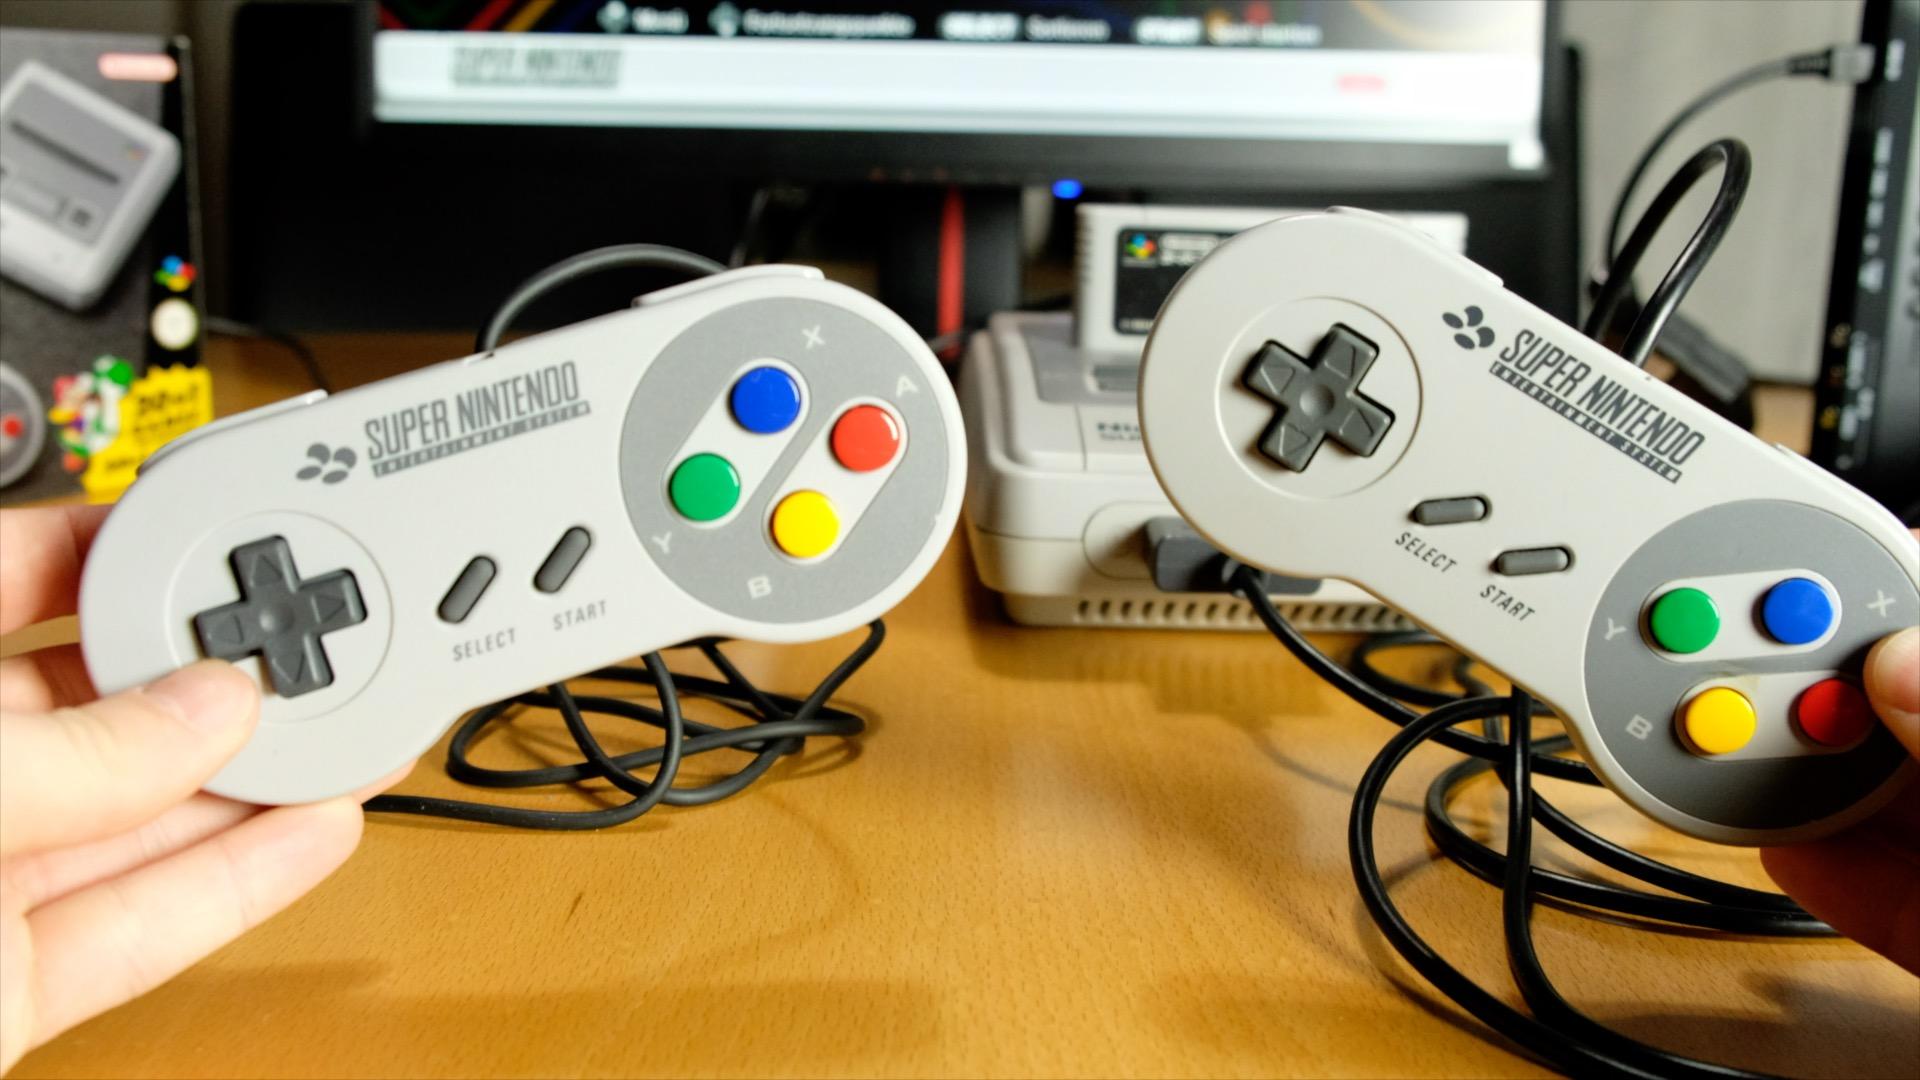 SNES Classic Mini im Vergleichstest: Putzige Retro-Konsole mit suboptimaler Emulation - Links der neue, rechts der alte Controller (Foto: Michael Wieczorek/Golem.de)